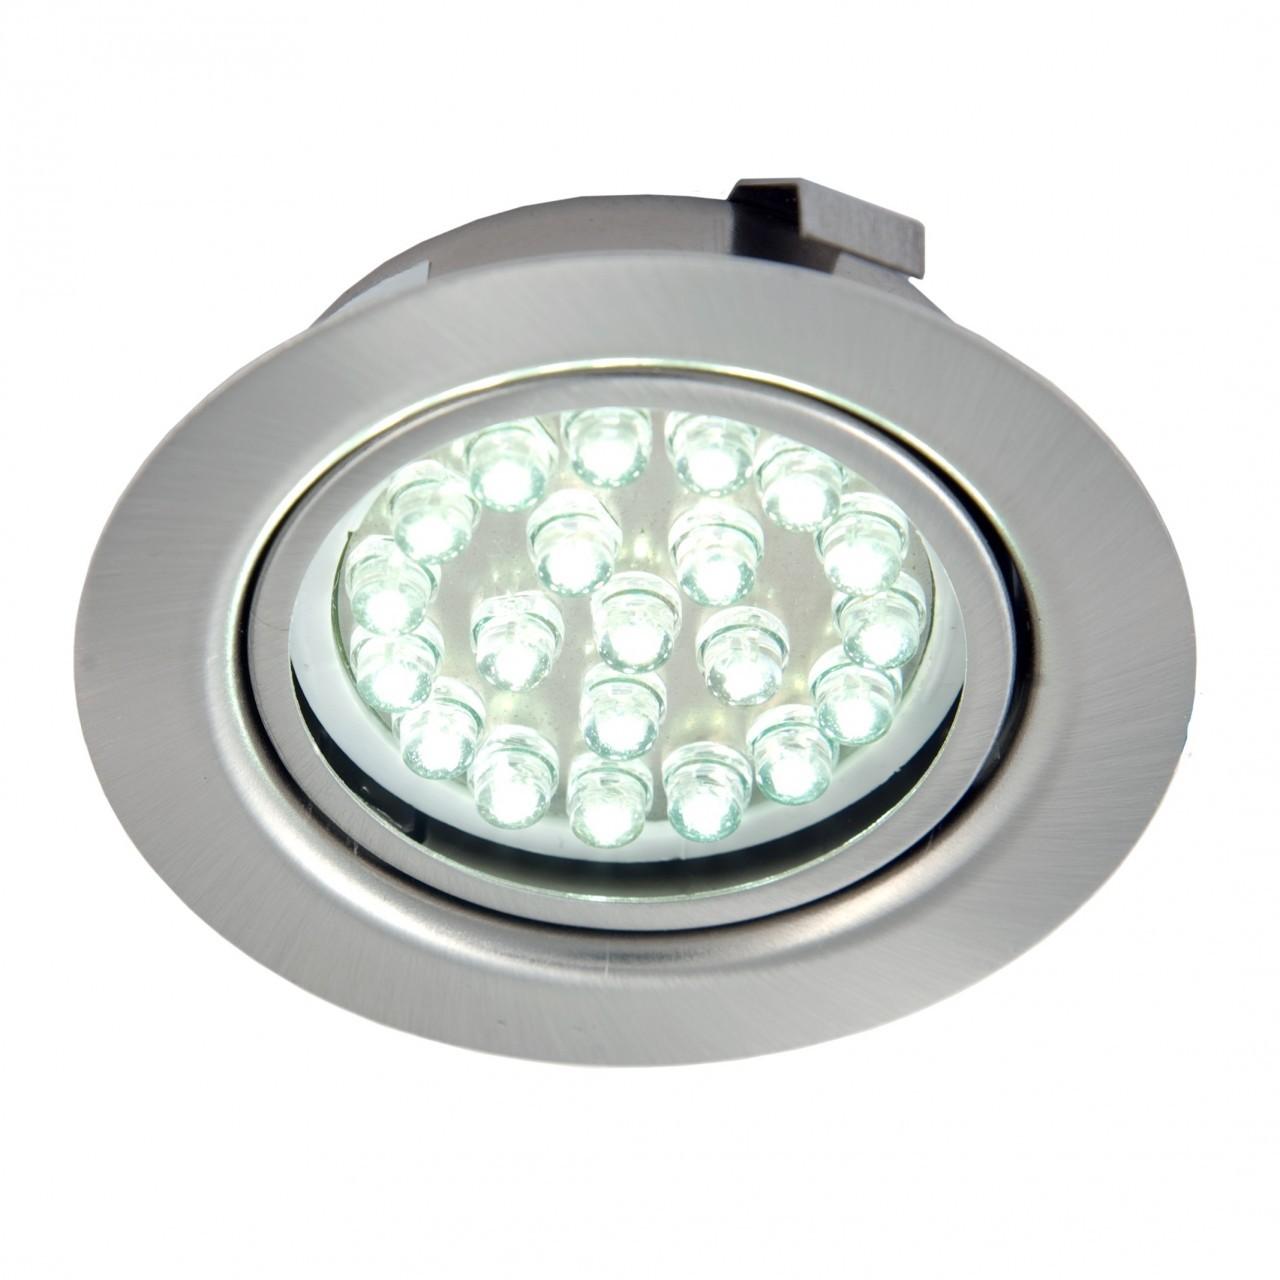 recessed 1 5w under cabinet light trinity lighting etc ltd in